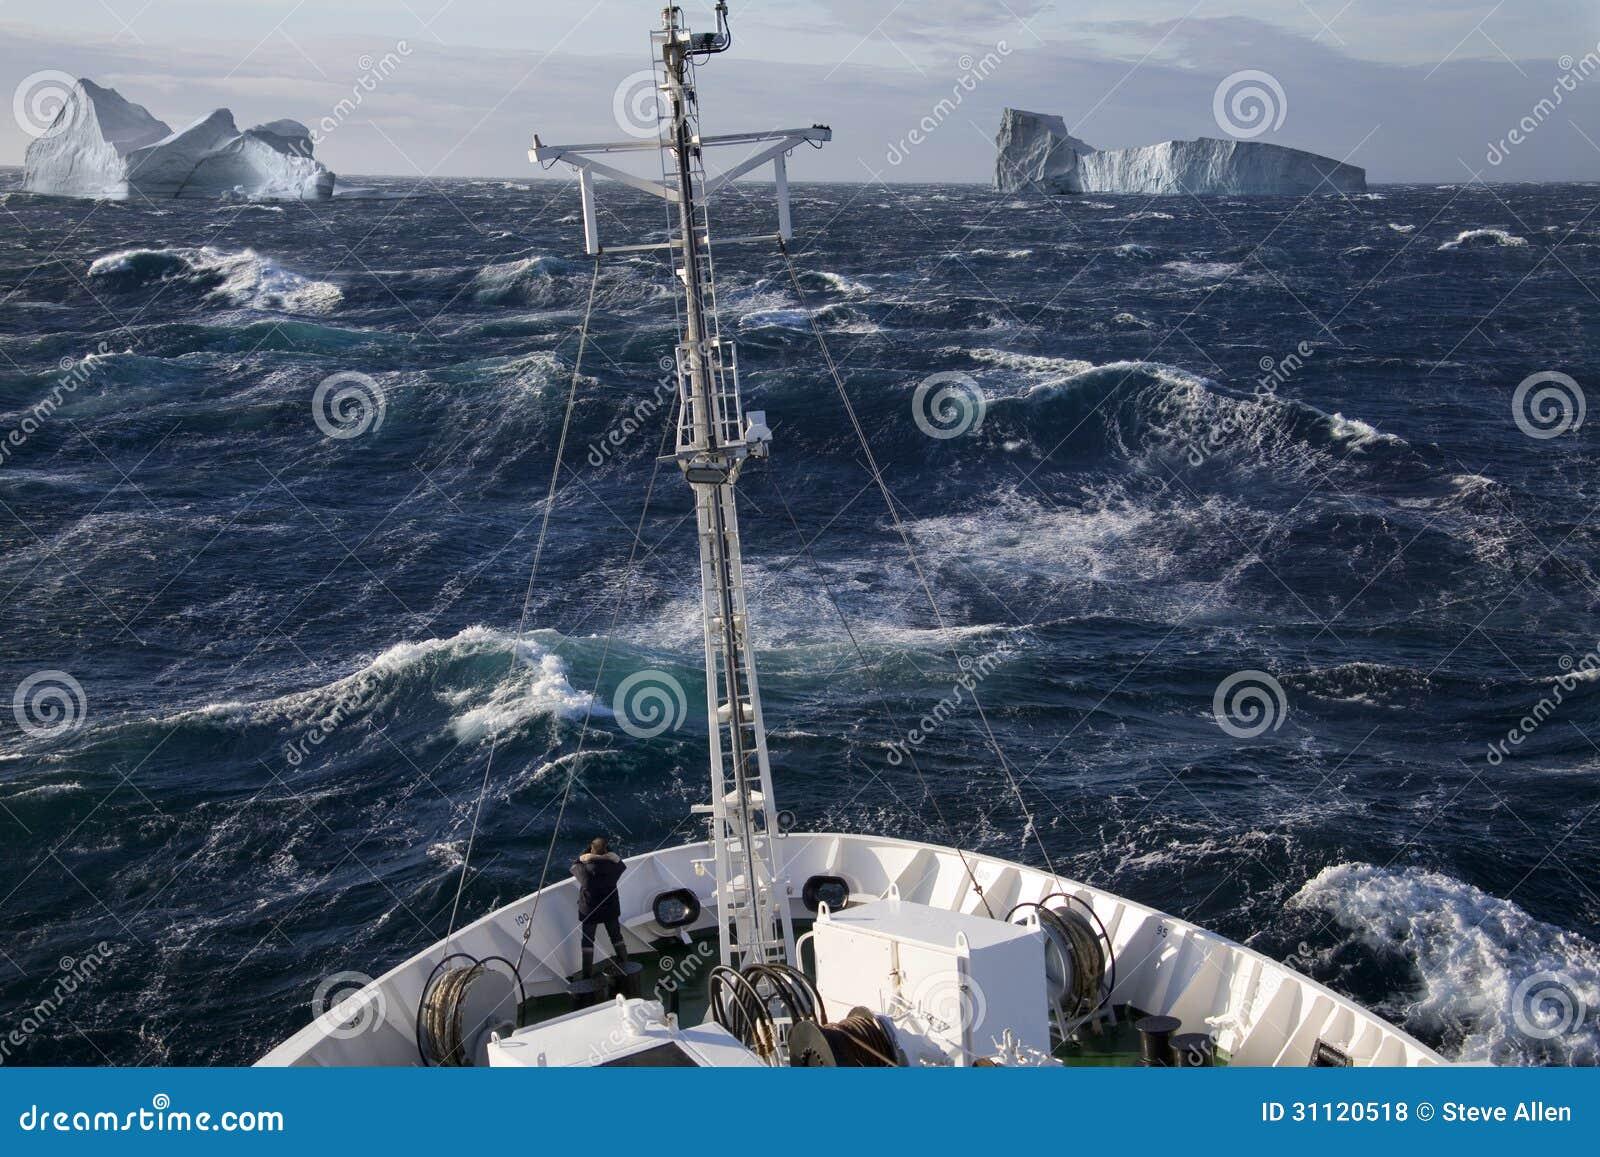 Arctic - Ship and Icebergs - Greenland